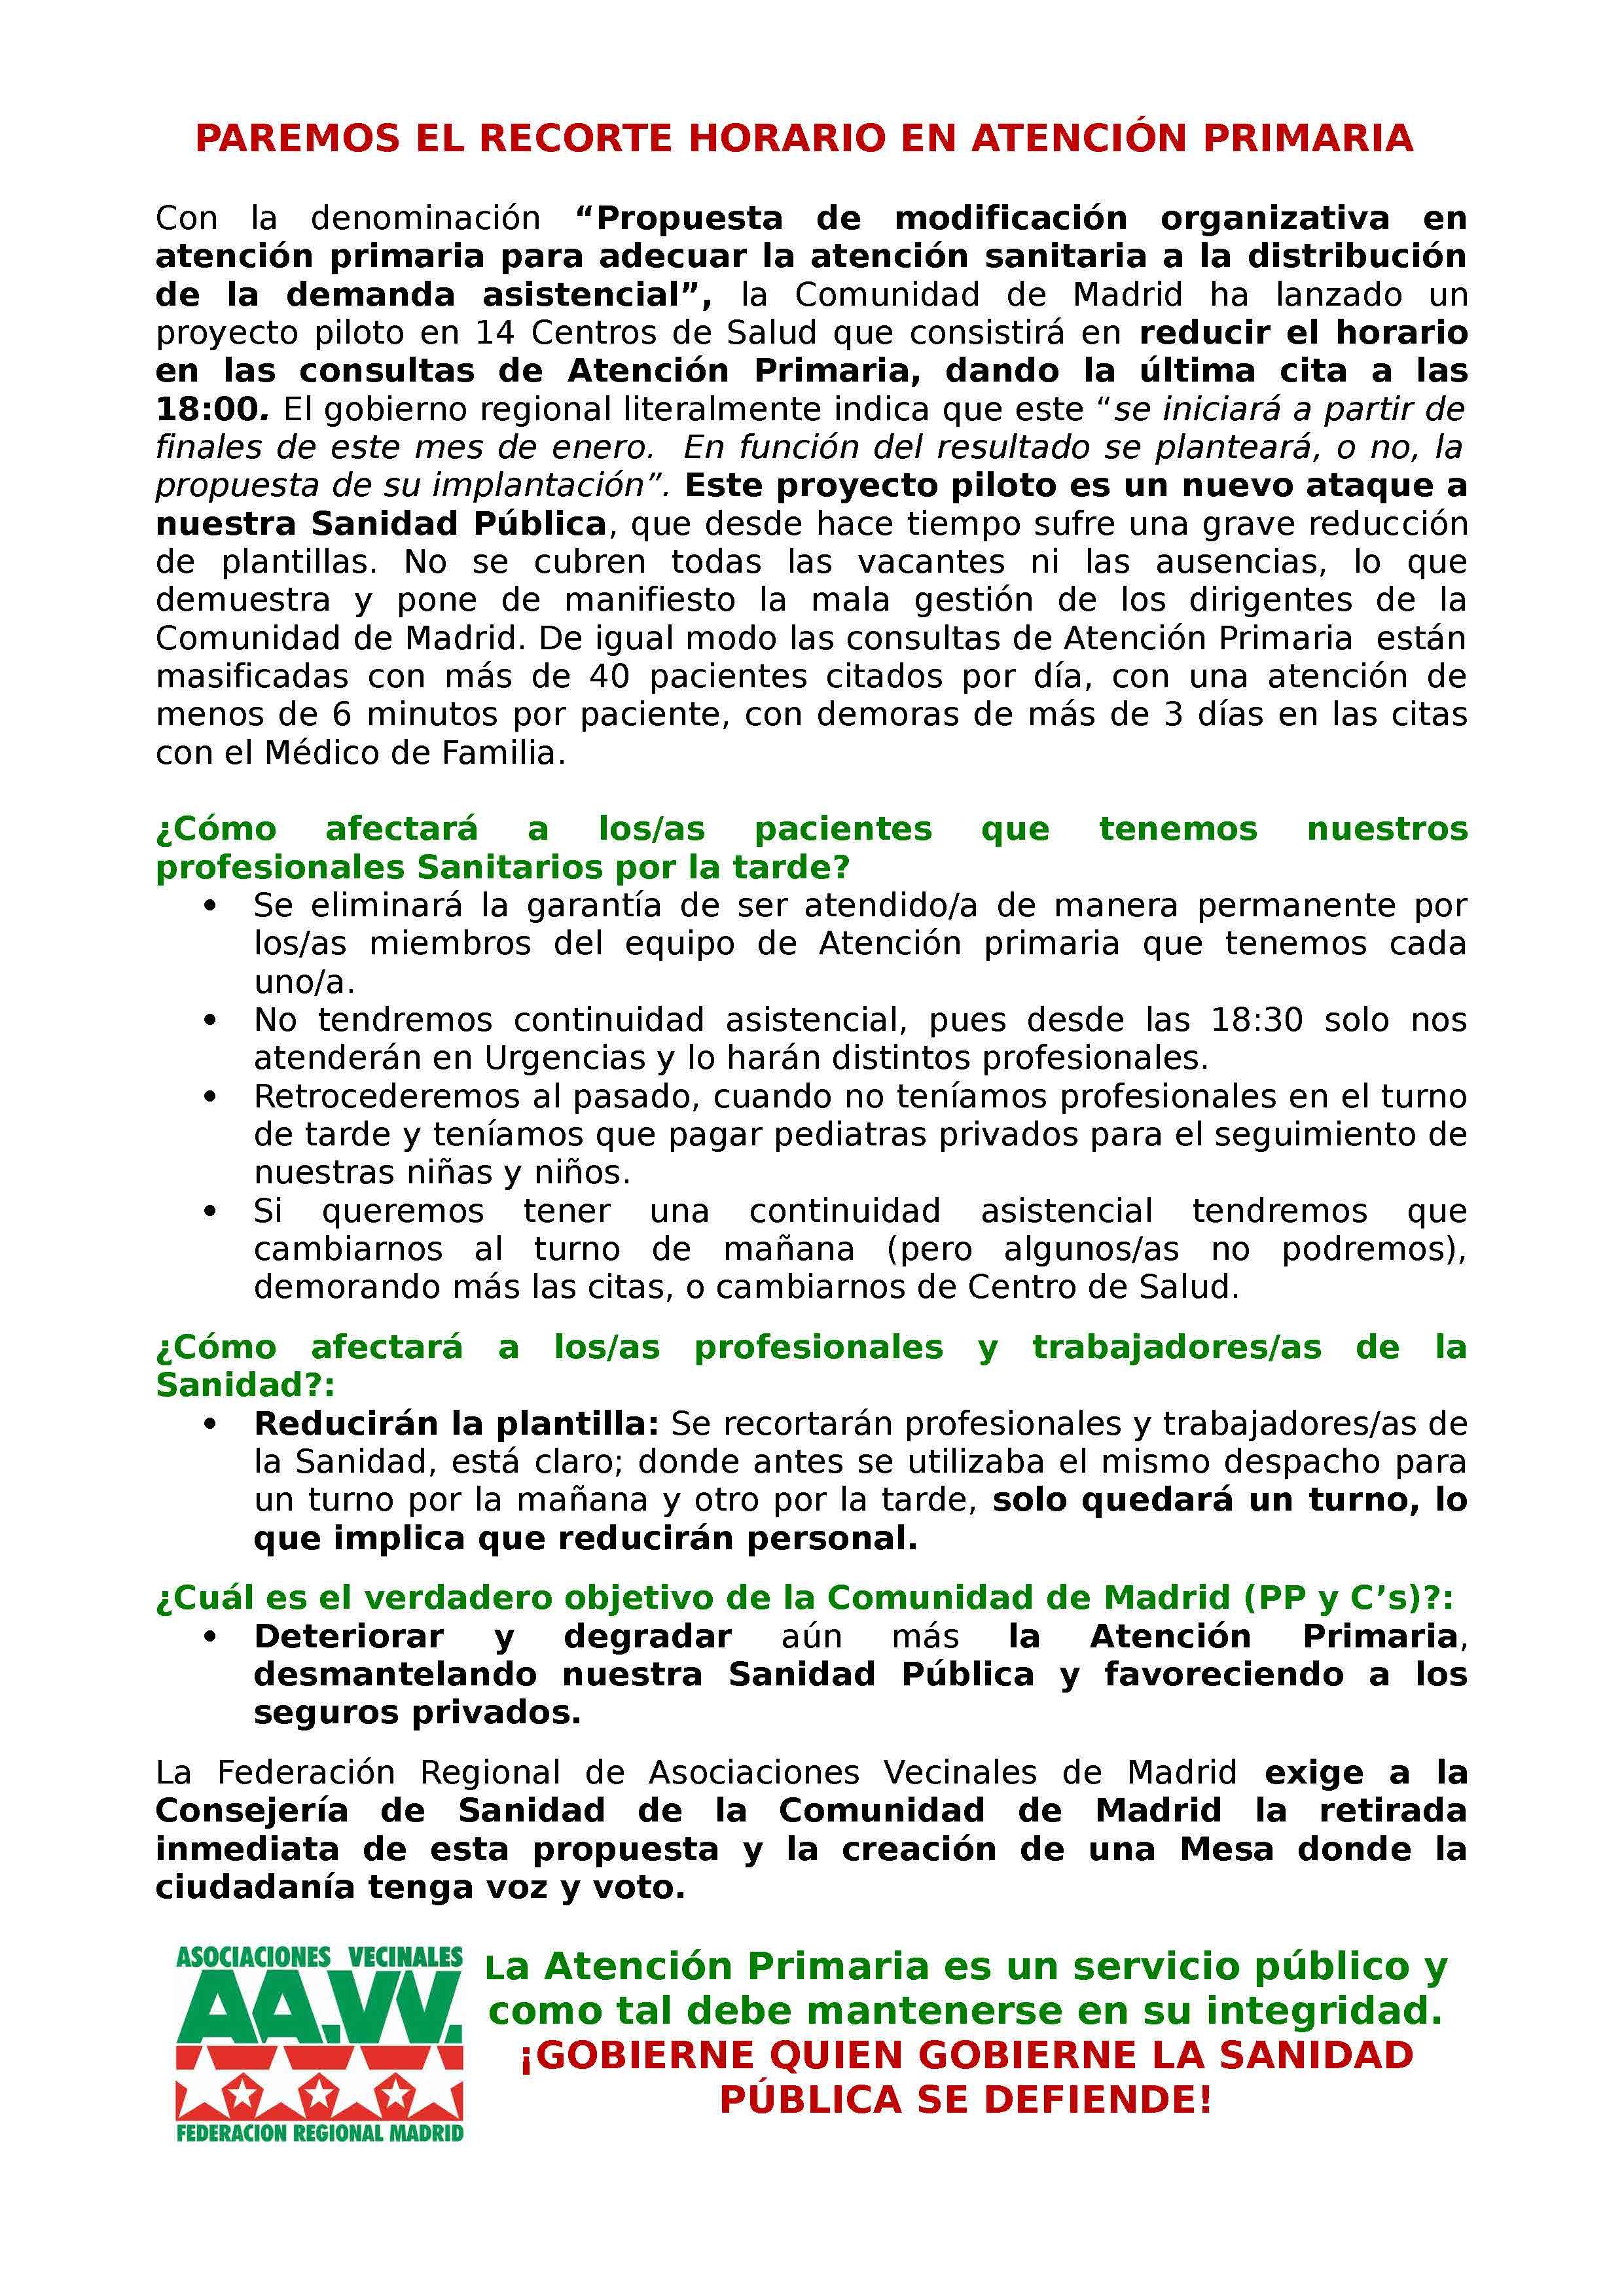 Comunicado_FRAVM_SANIDAD_aavvvirgencortijo_31EN2019